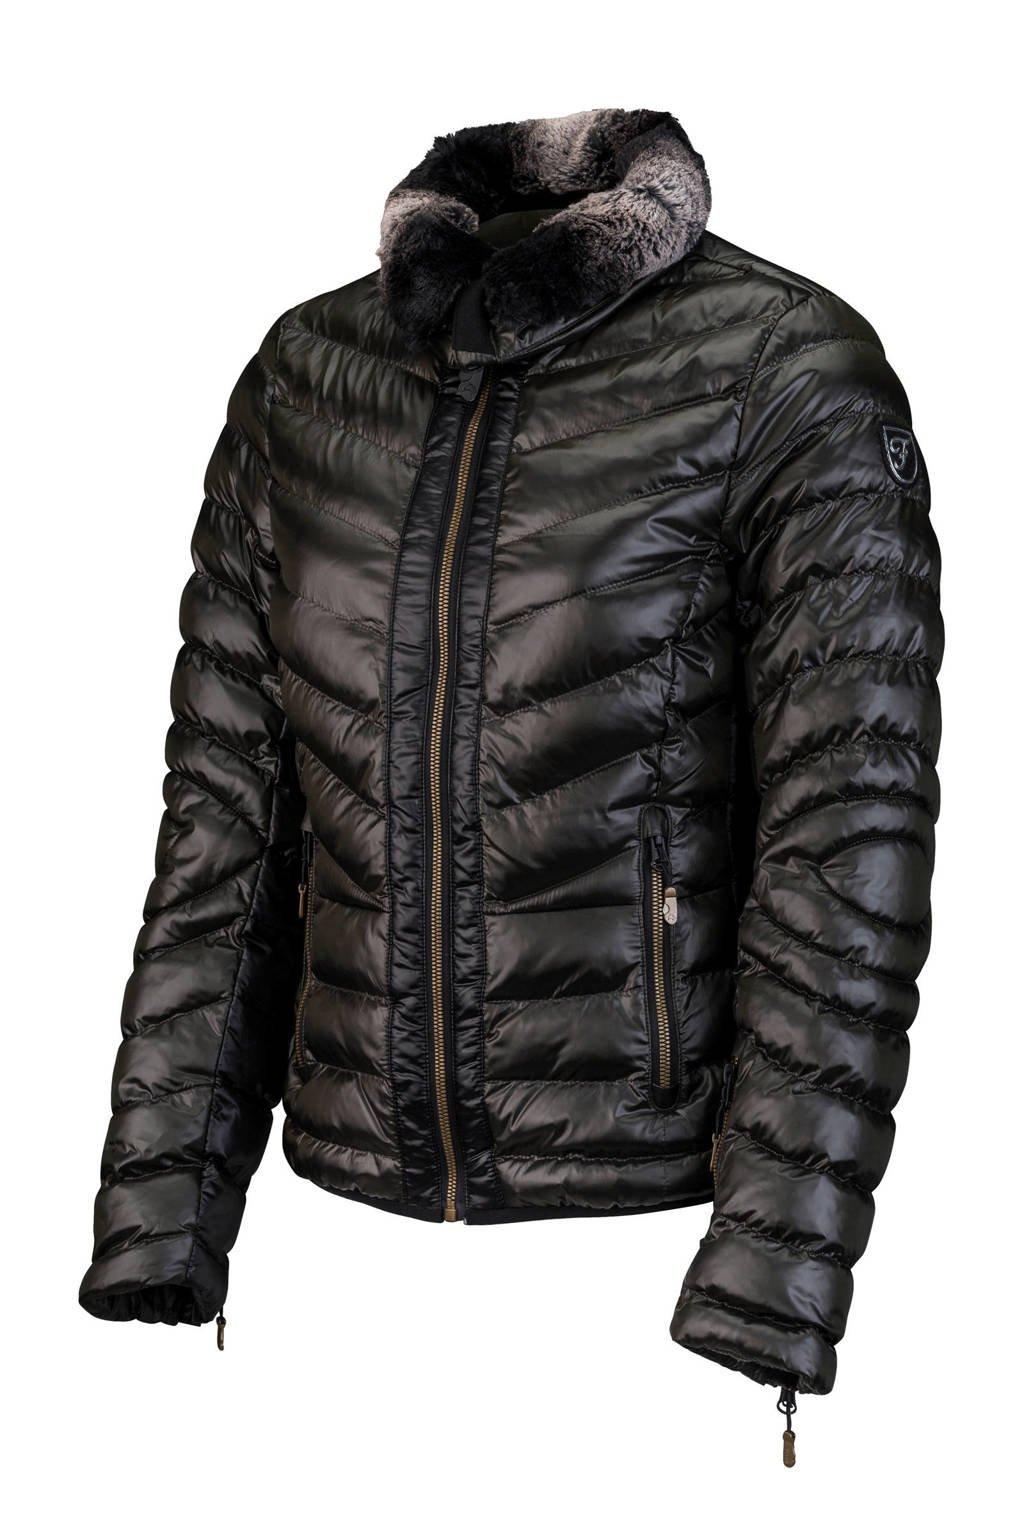 Falcon Ski-jack Christelle olijfgroen/zwart, Zwart/olijfgroen/zwart